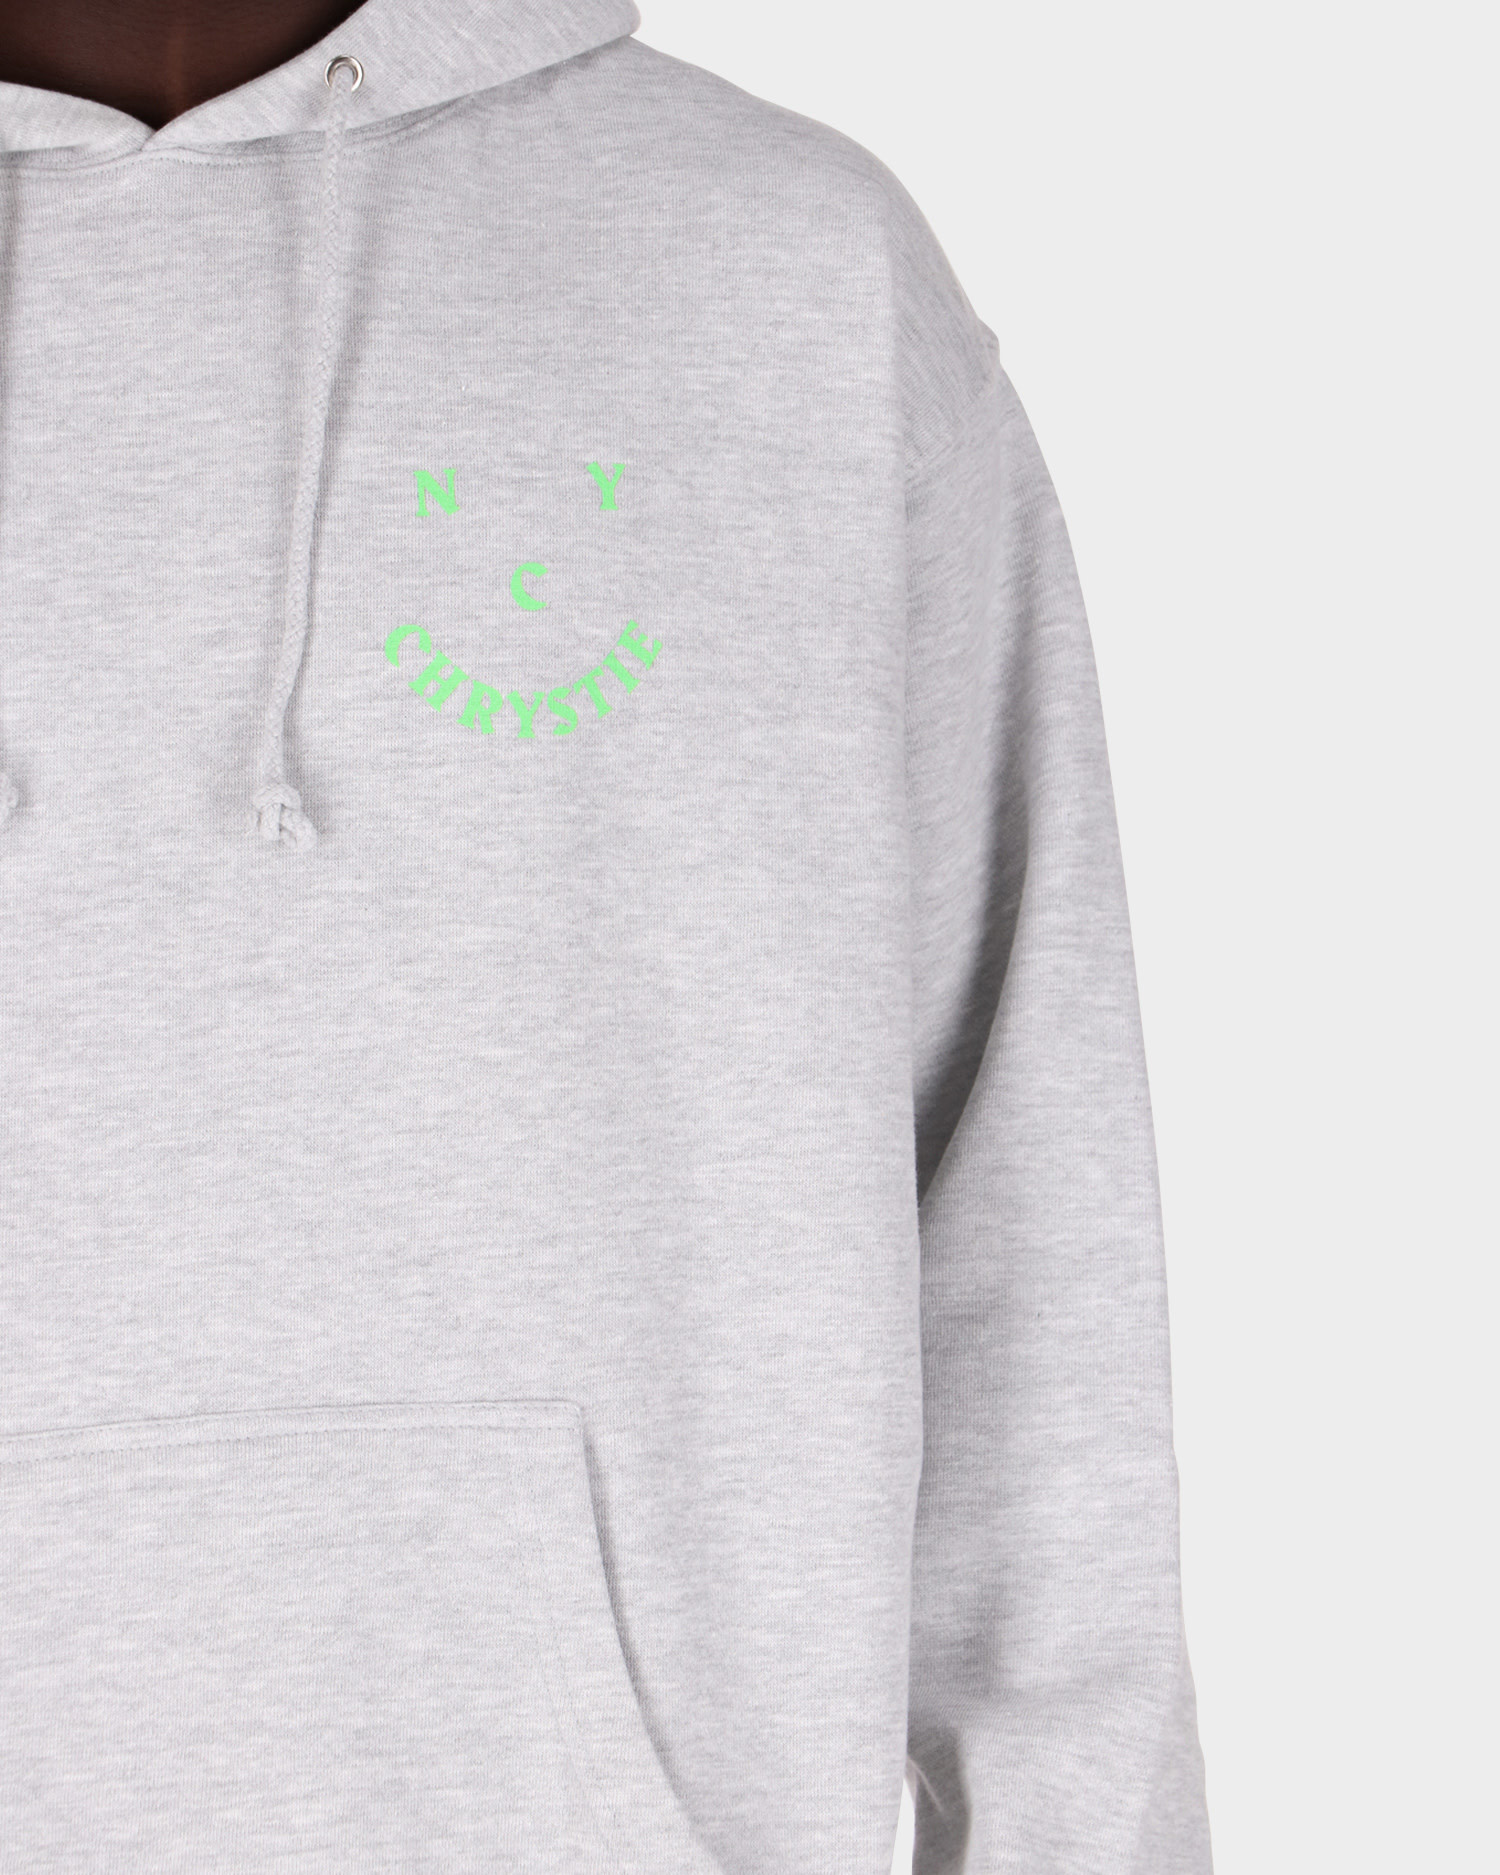 Chrystie NYC - Smile Logo Hoodieheather Grey heather grey